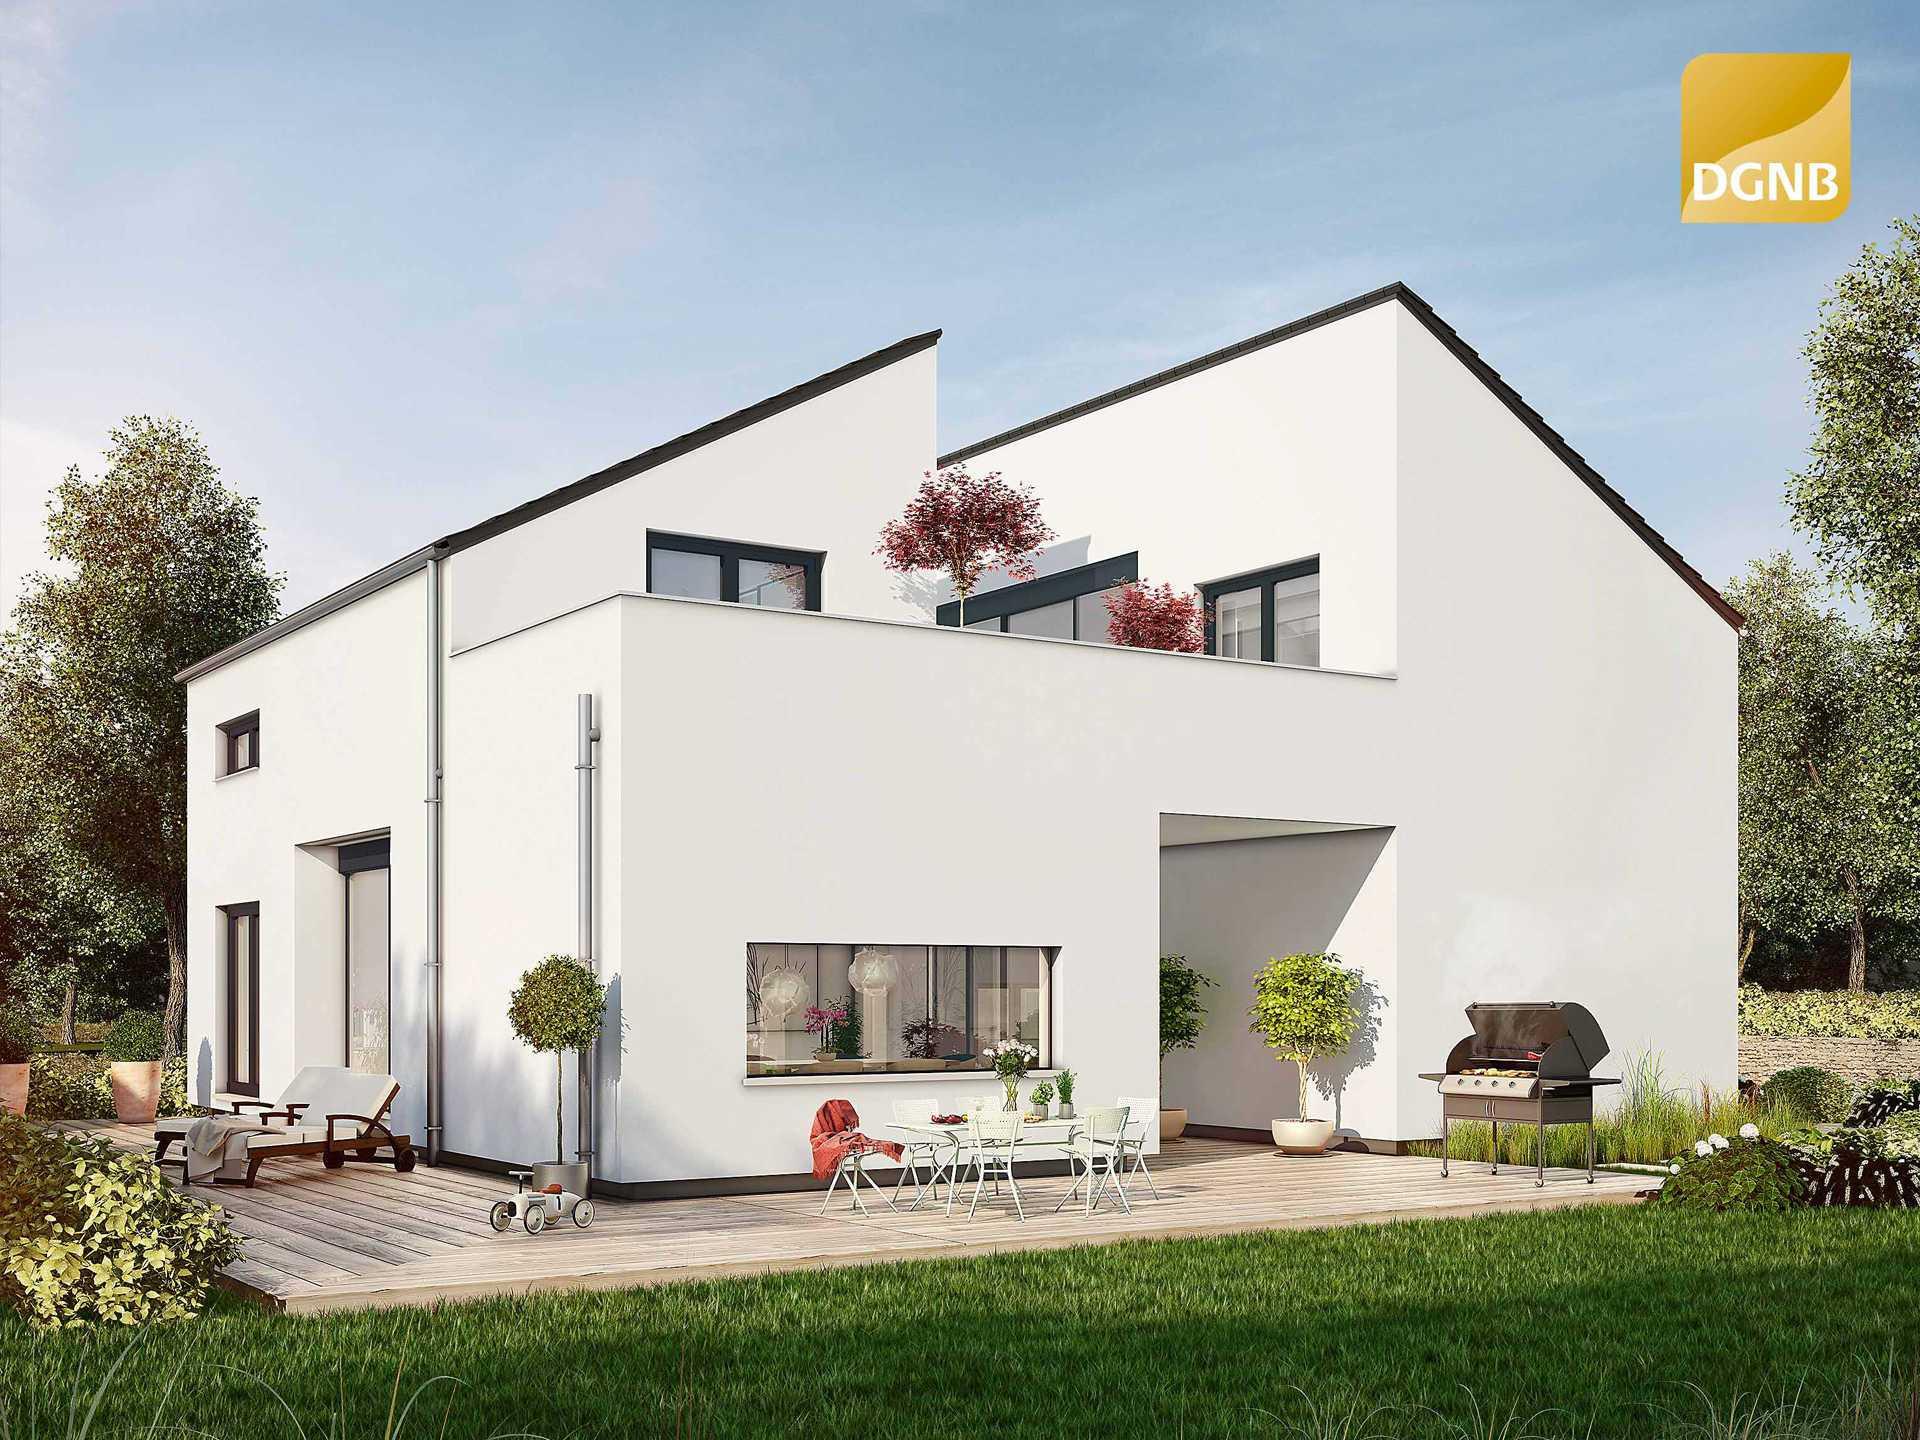 Best Bad Vilbel Musterhaus öffnungszeiten Photos - Thehammondreport ...